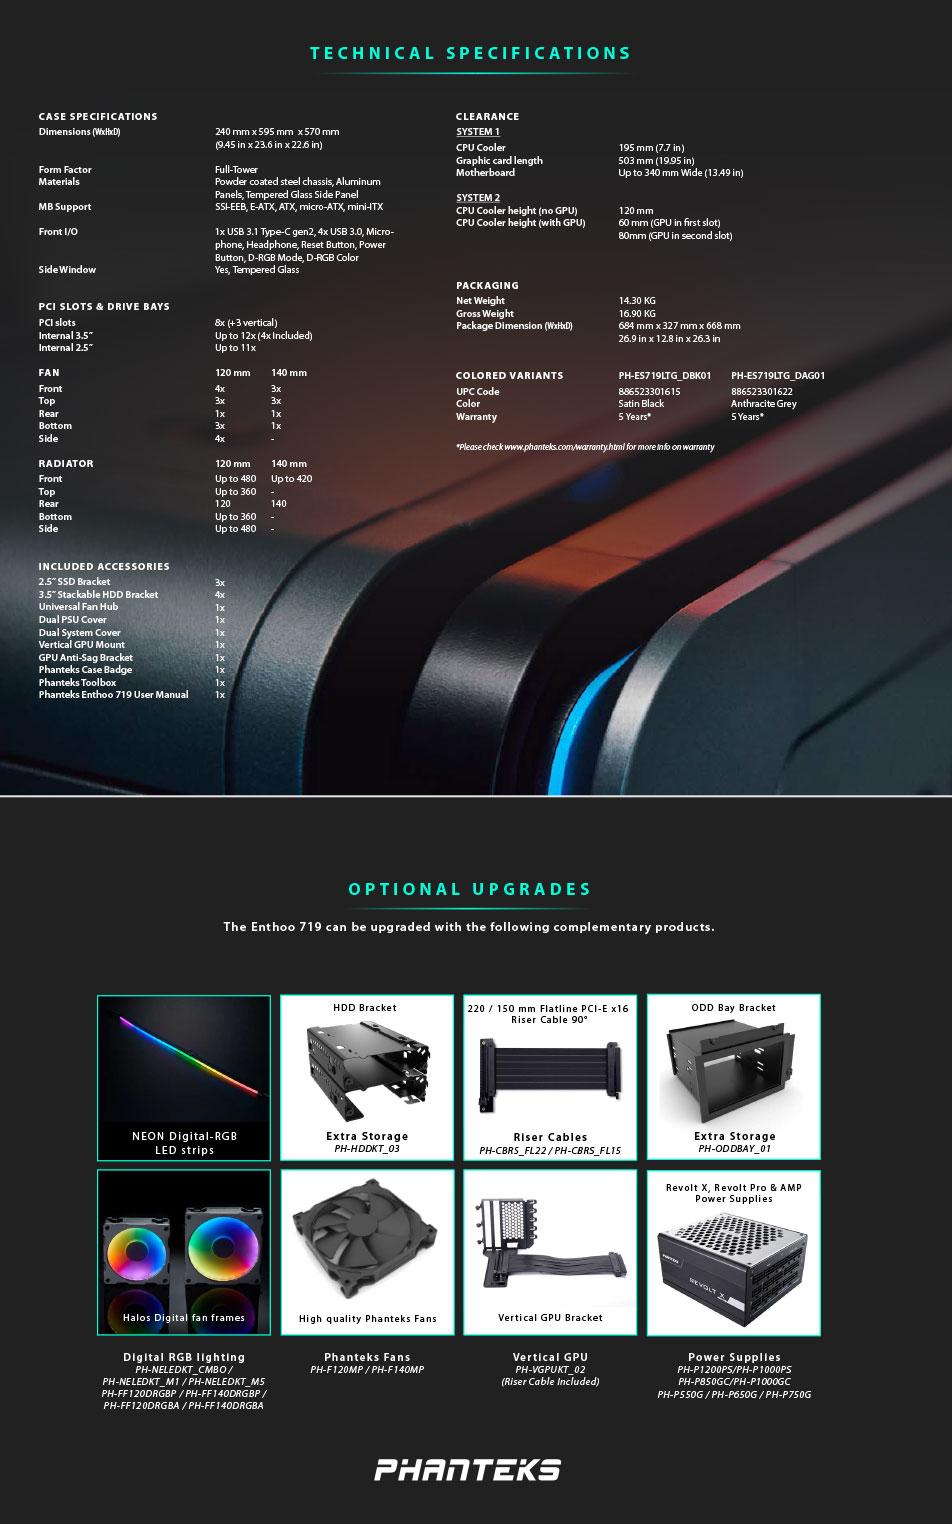 Phanteks Enthoo 719 D-RGB TG Full Tower Case Satin Black features 4